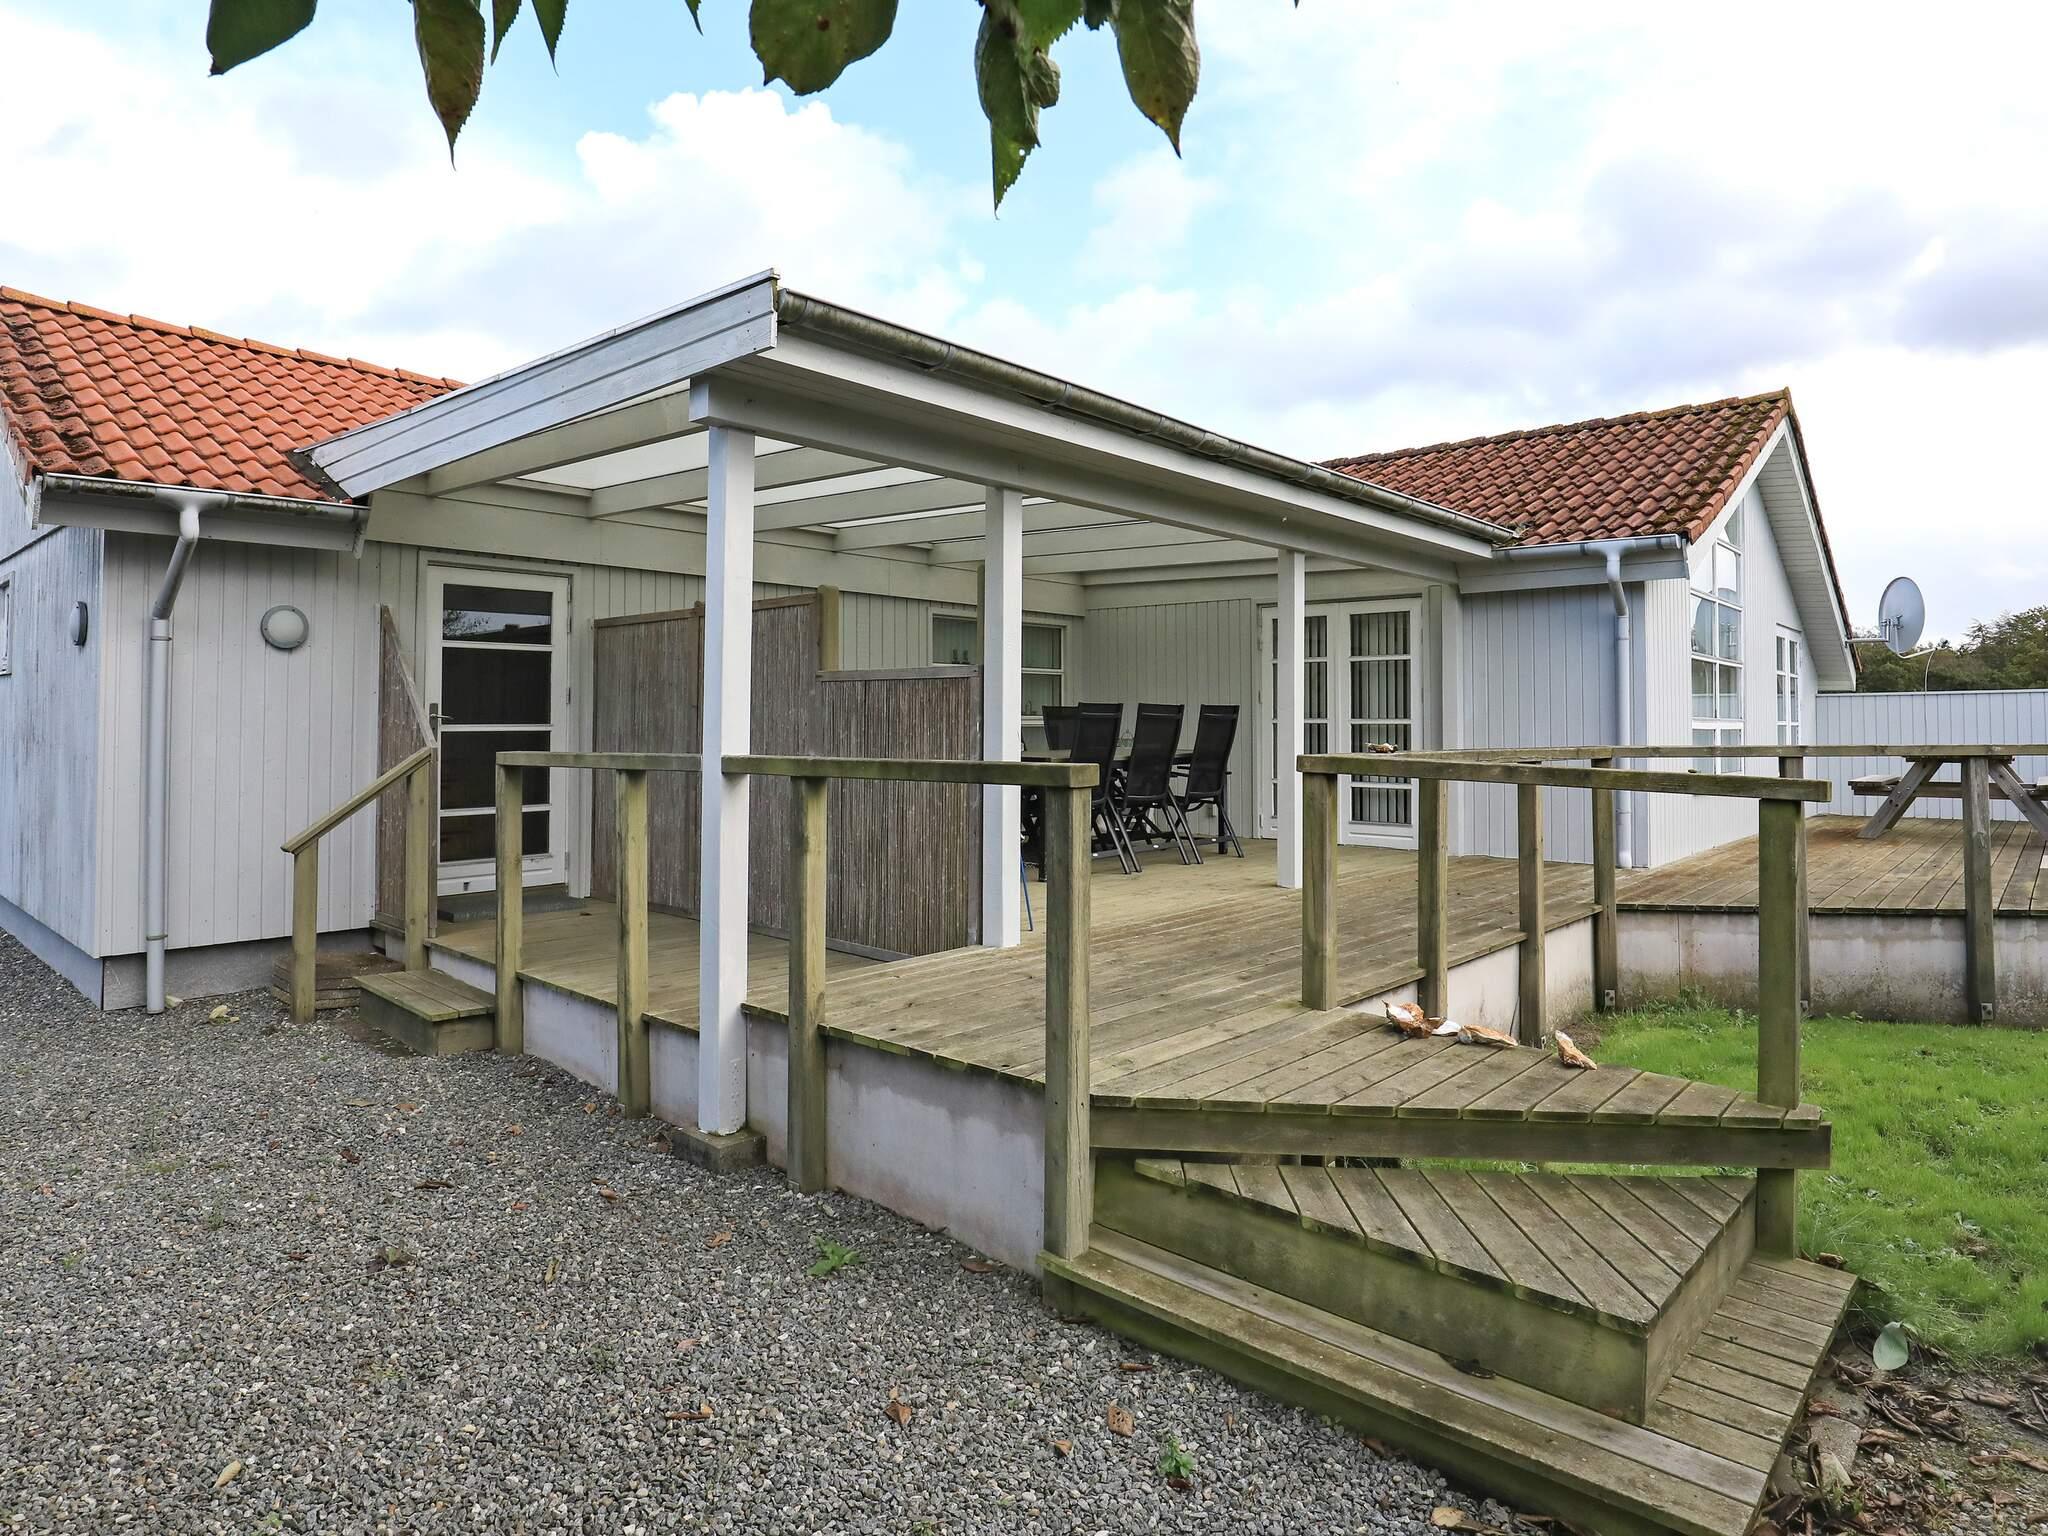 Ferienhaus Eskov Strandpark (1079937), Roslev, , Limfjord, Dänemark, Bild 15